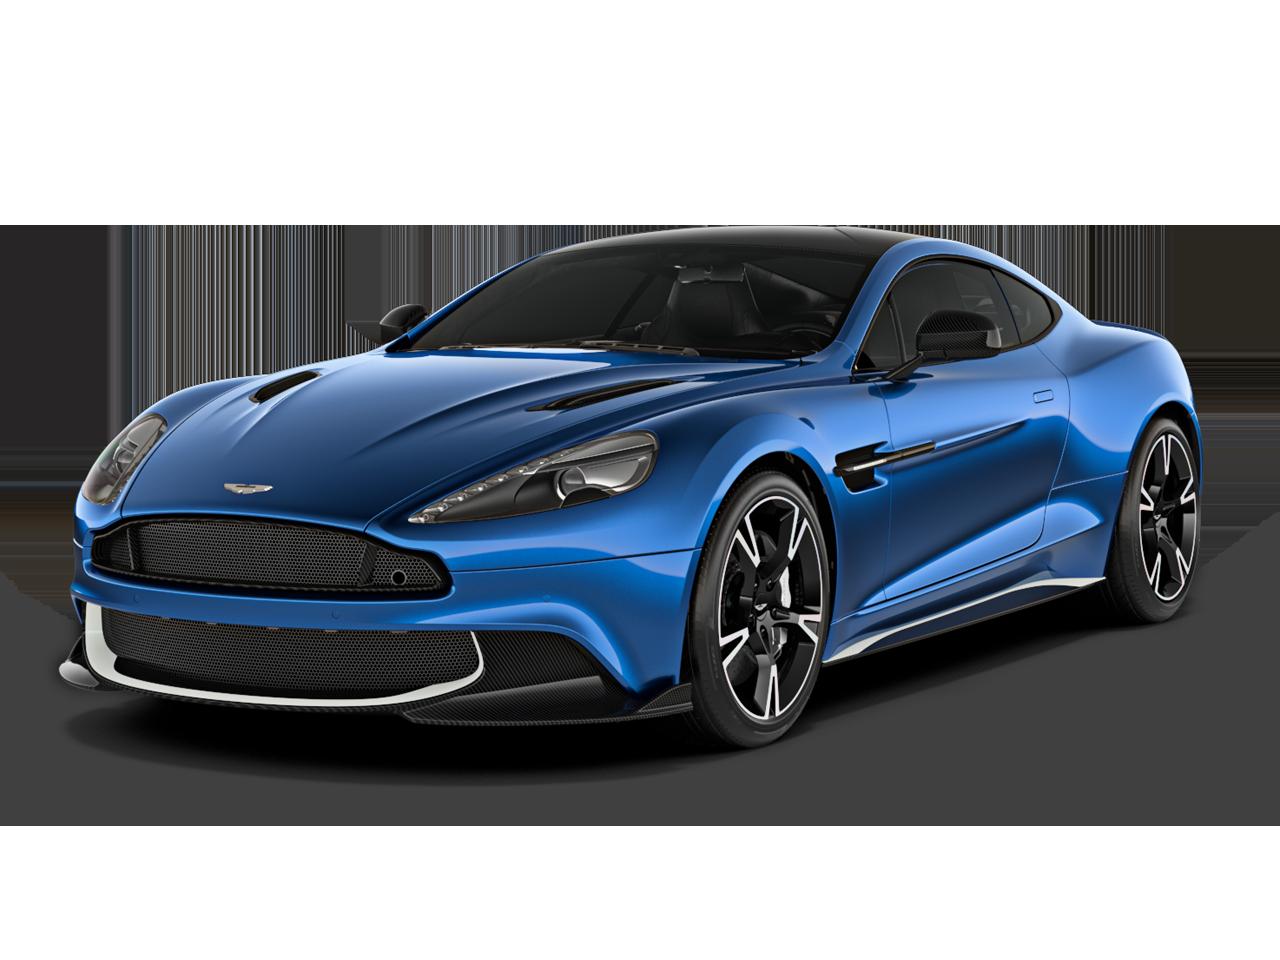 Aston Martin Vanquish Van Nuys Aston Martin Dealer Los Angeles - Galpin aston martin inventory